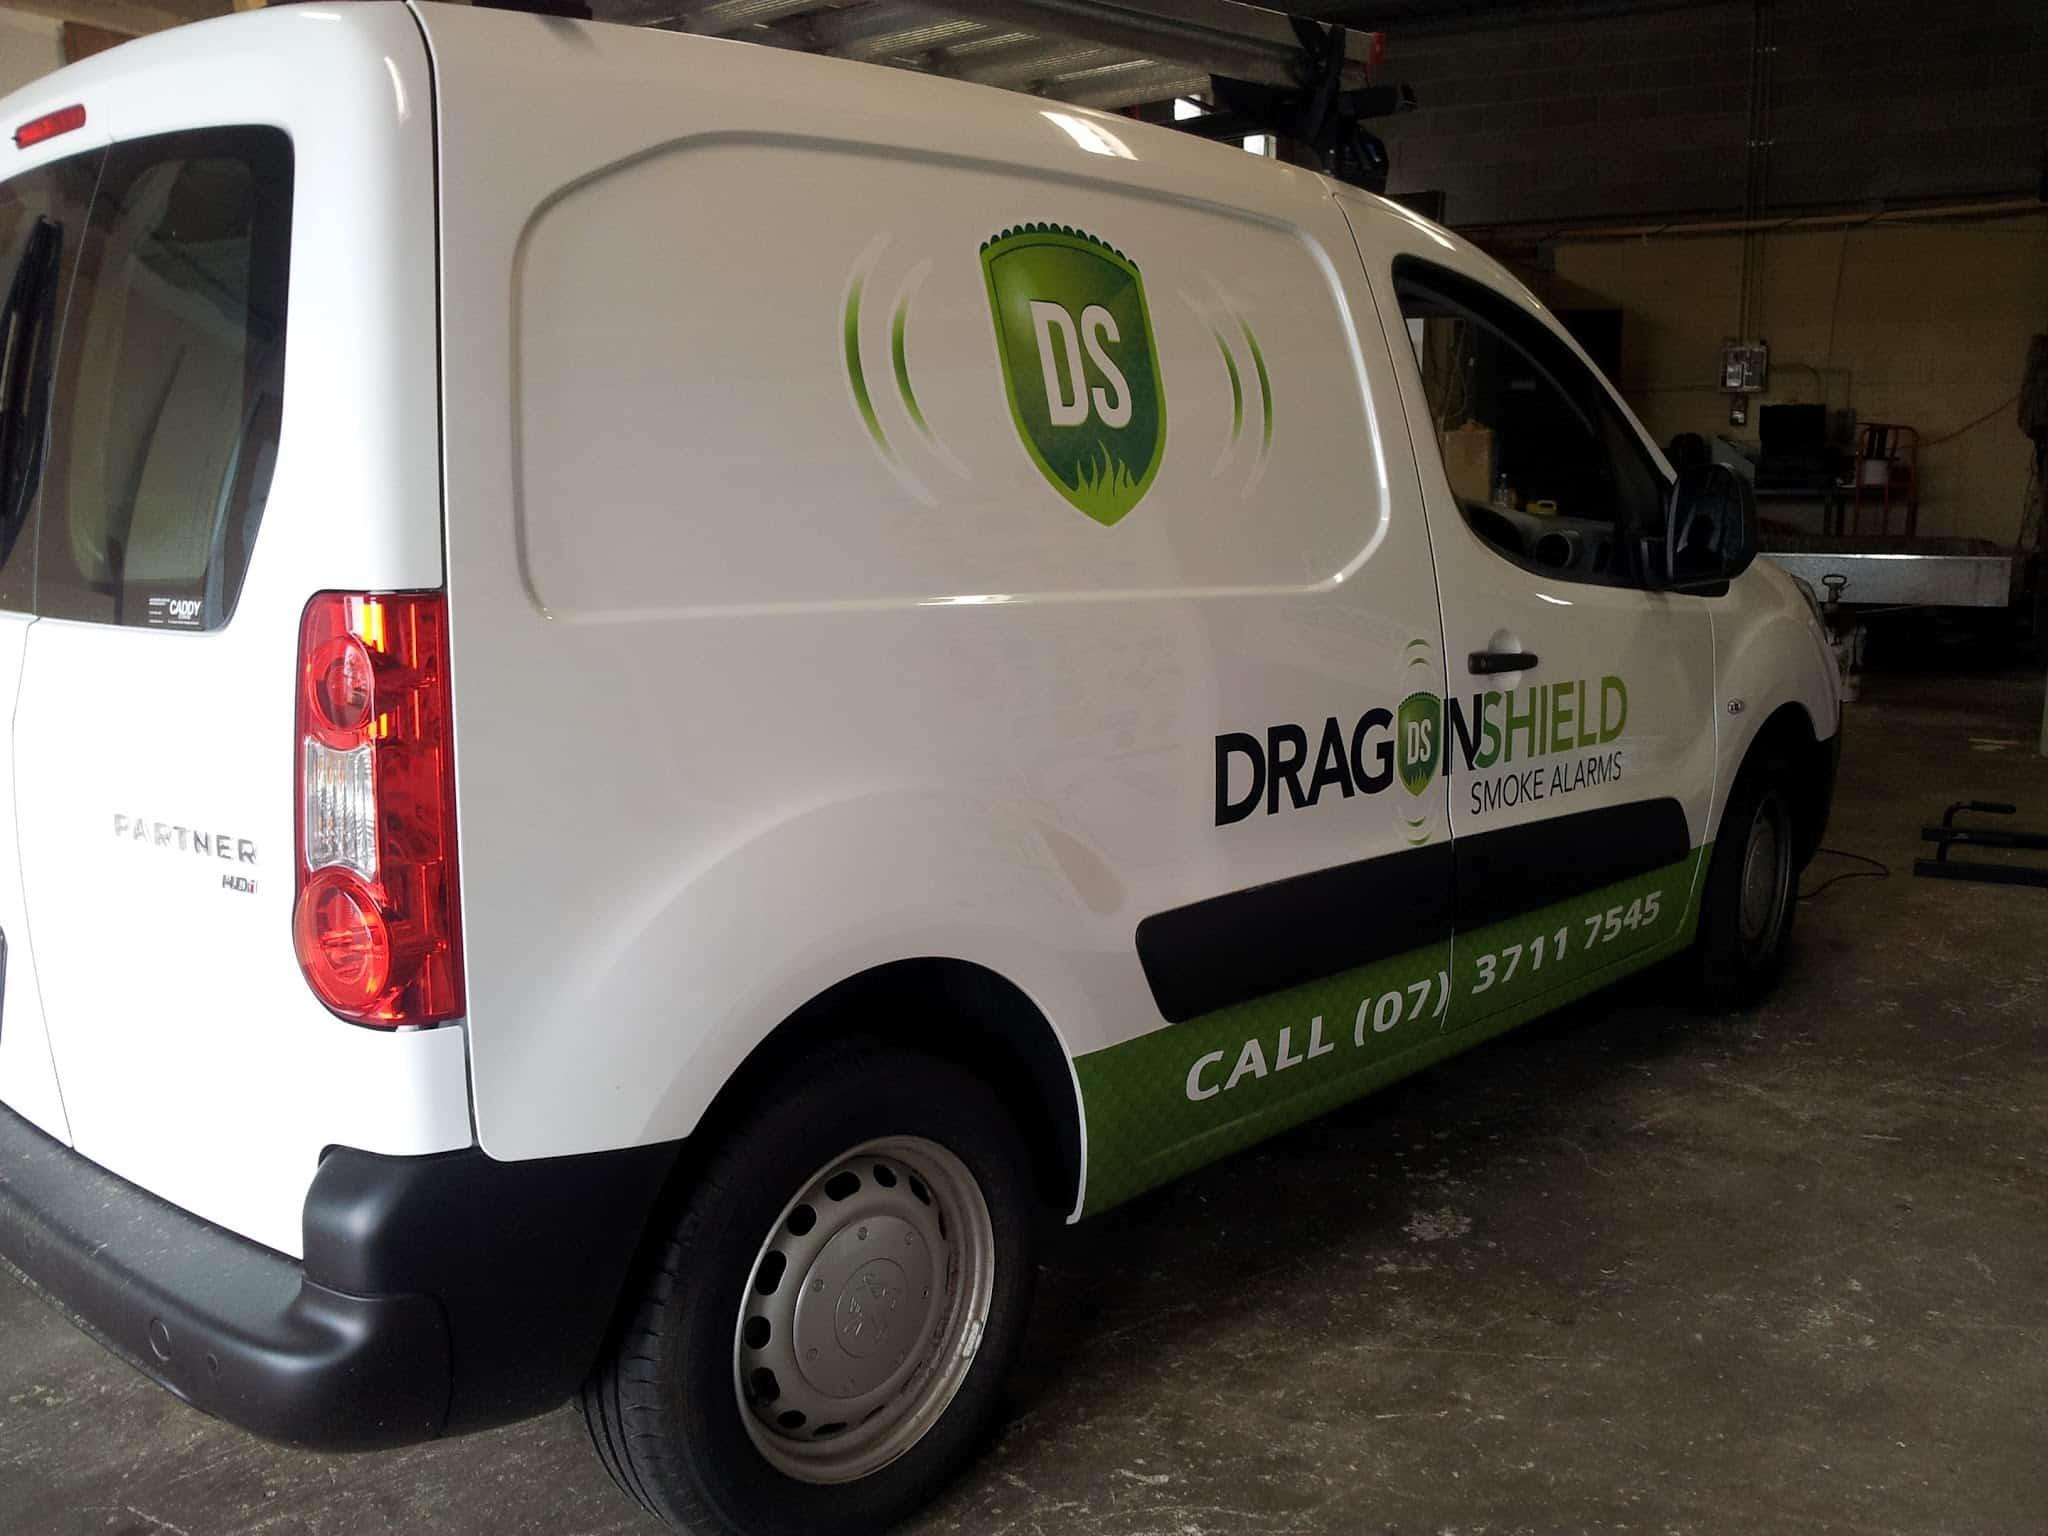 Dragon Shield Smoke Alarms Vehicle Signage